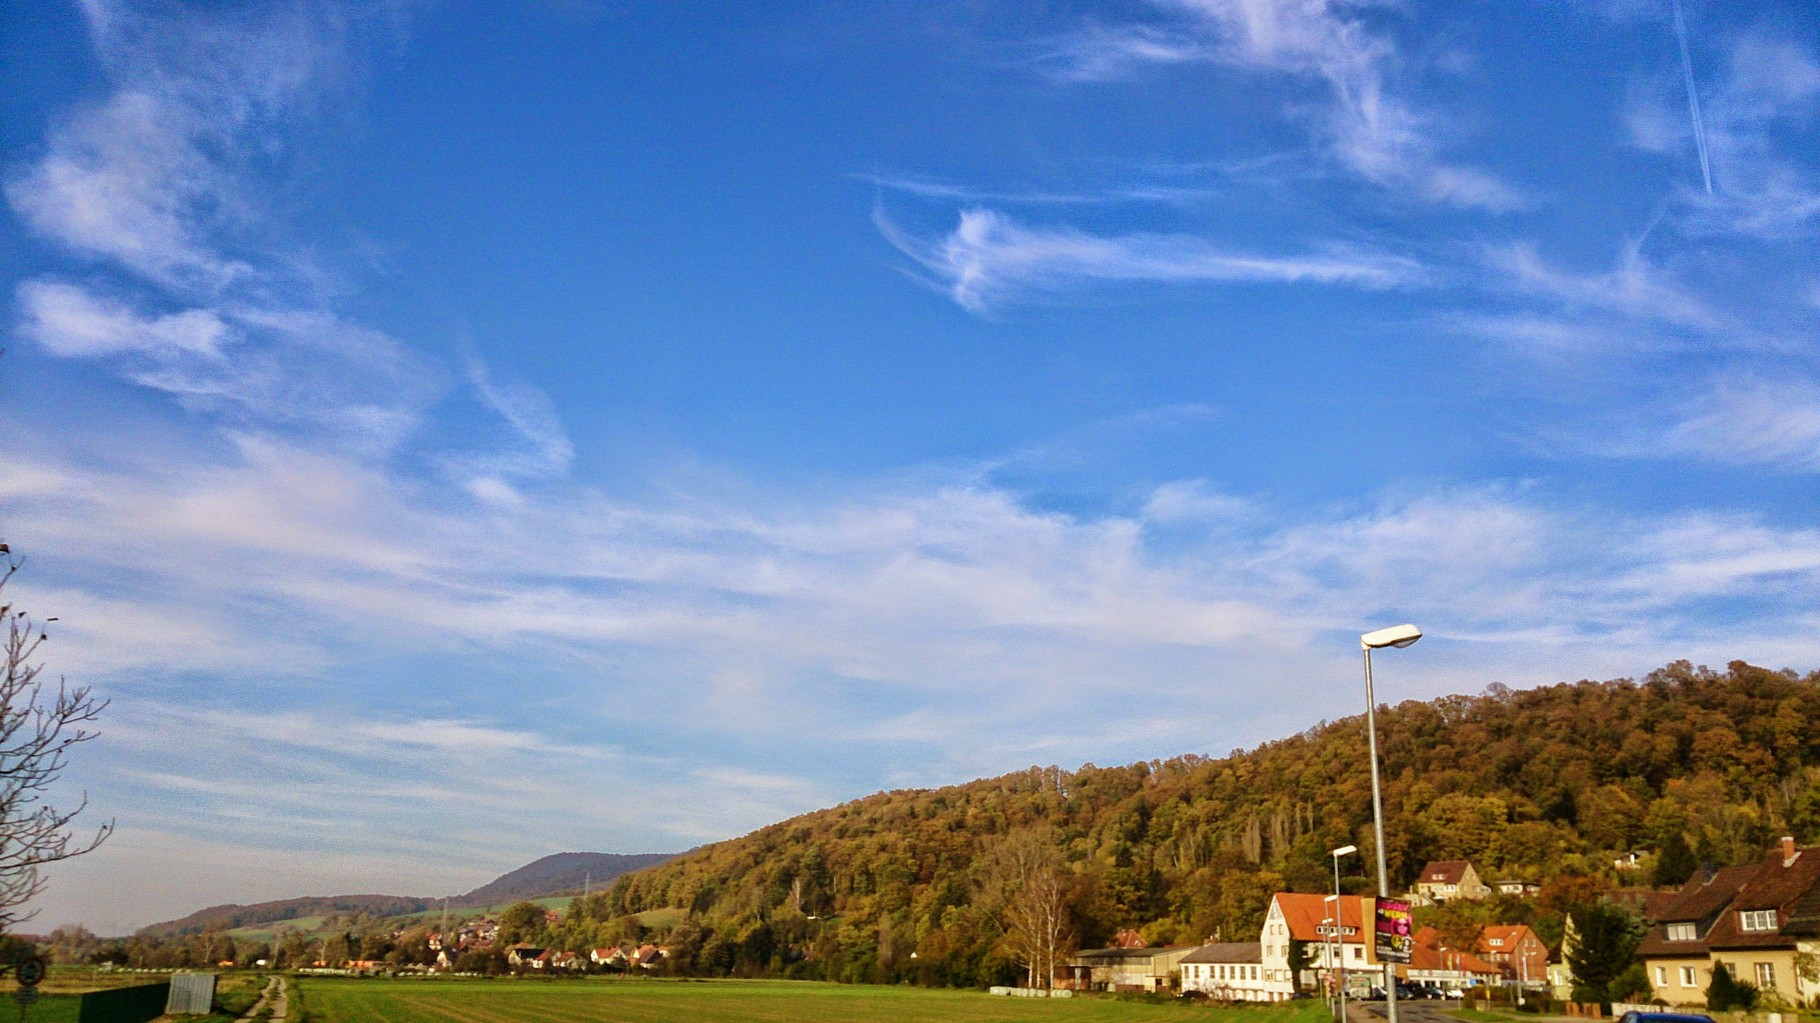 ~ Bild: 7-Berge-Ausklang bei Alfeld (Leine) ~